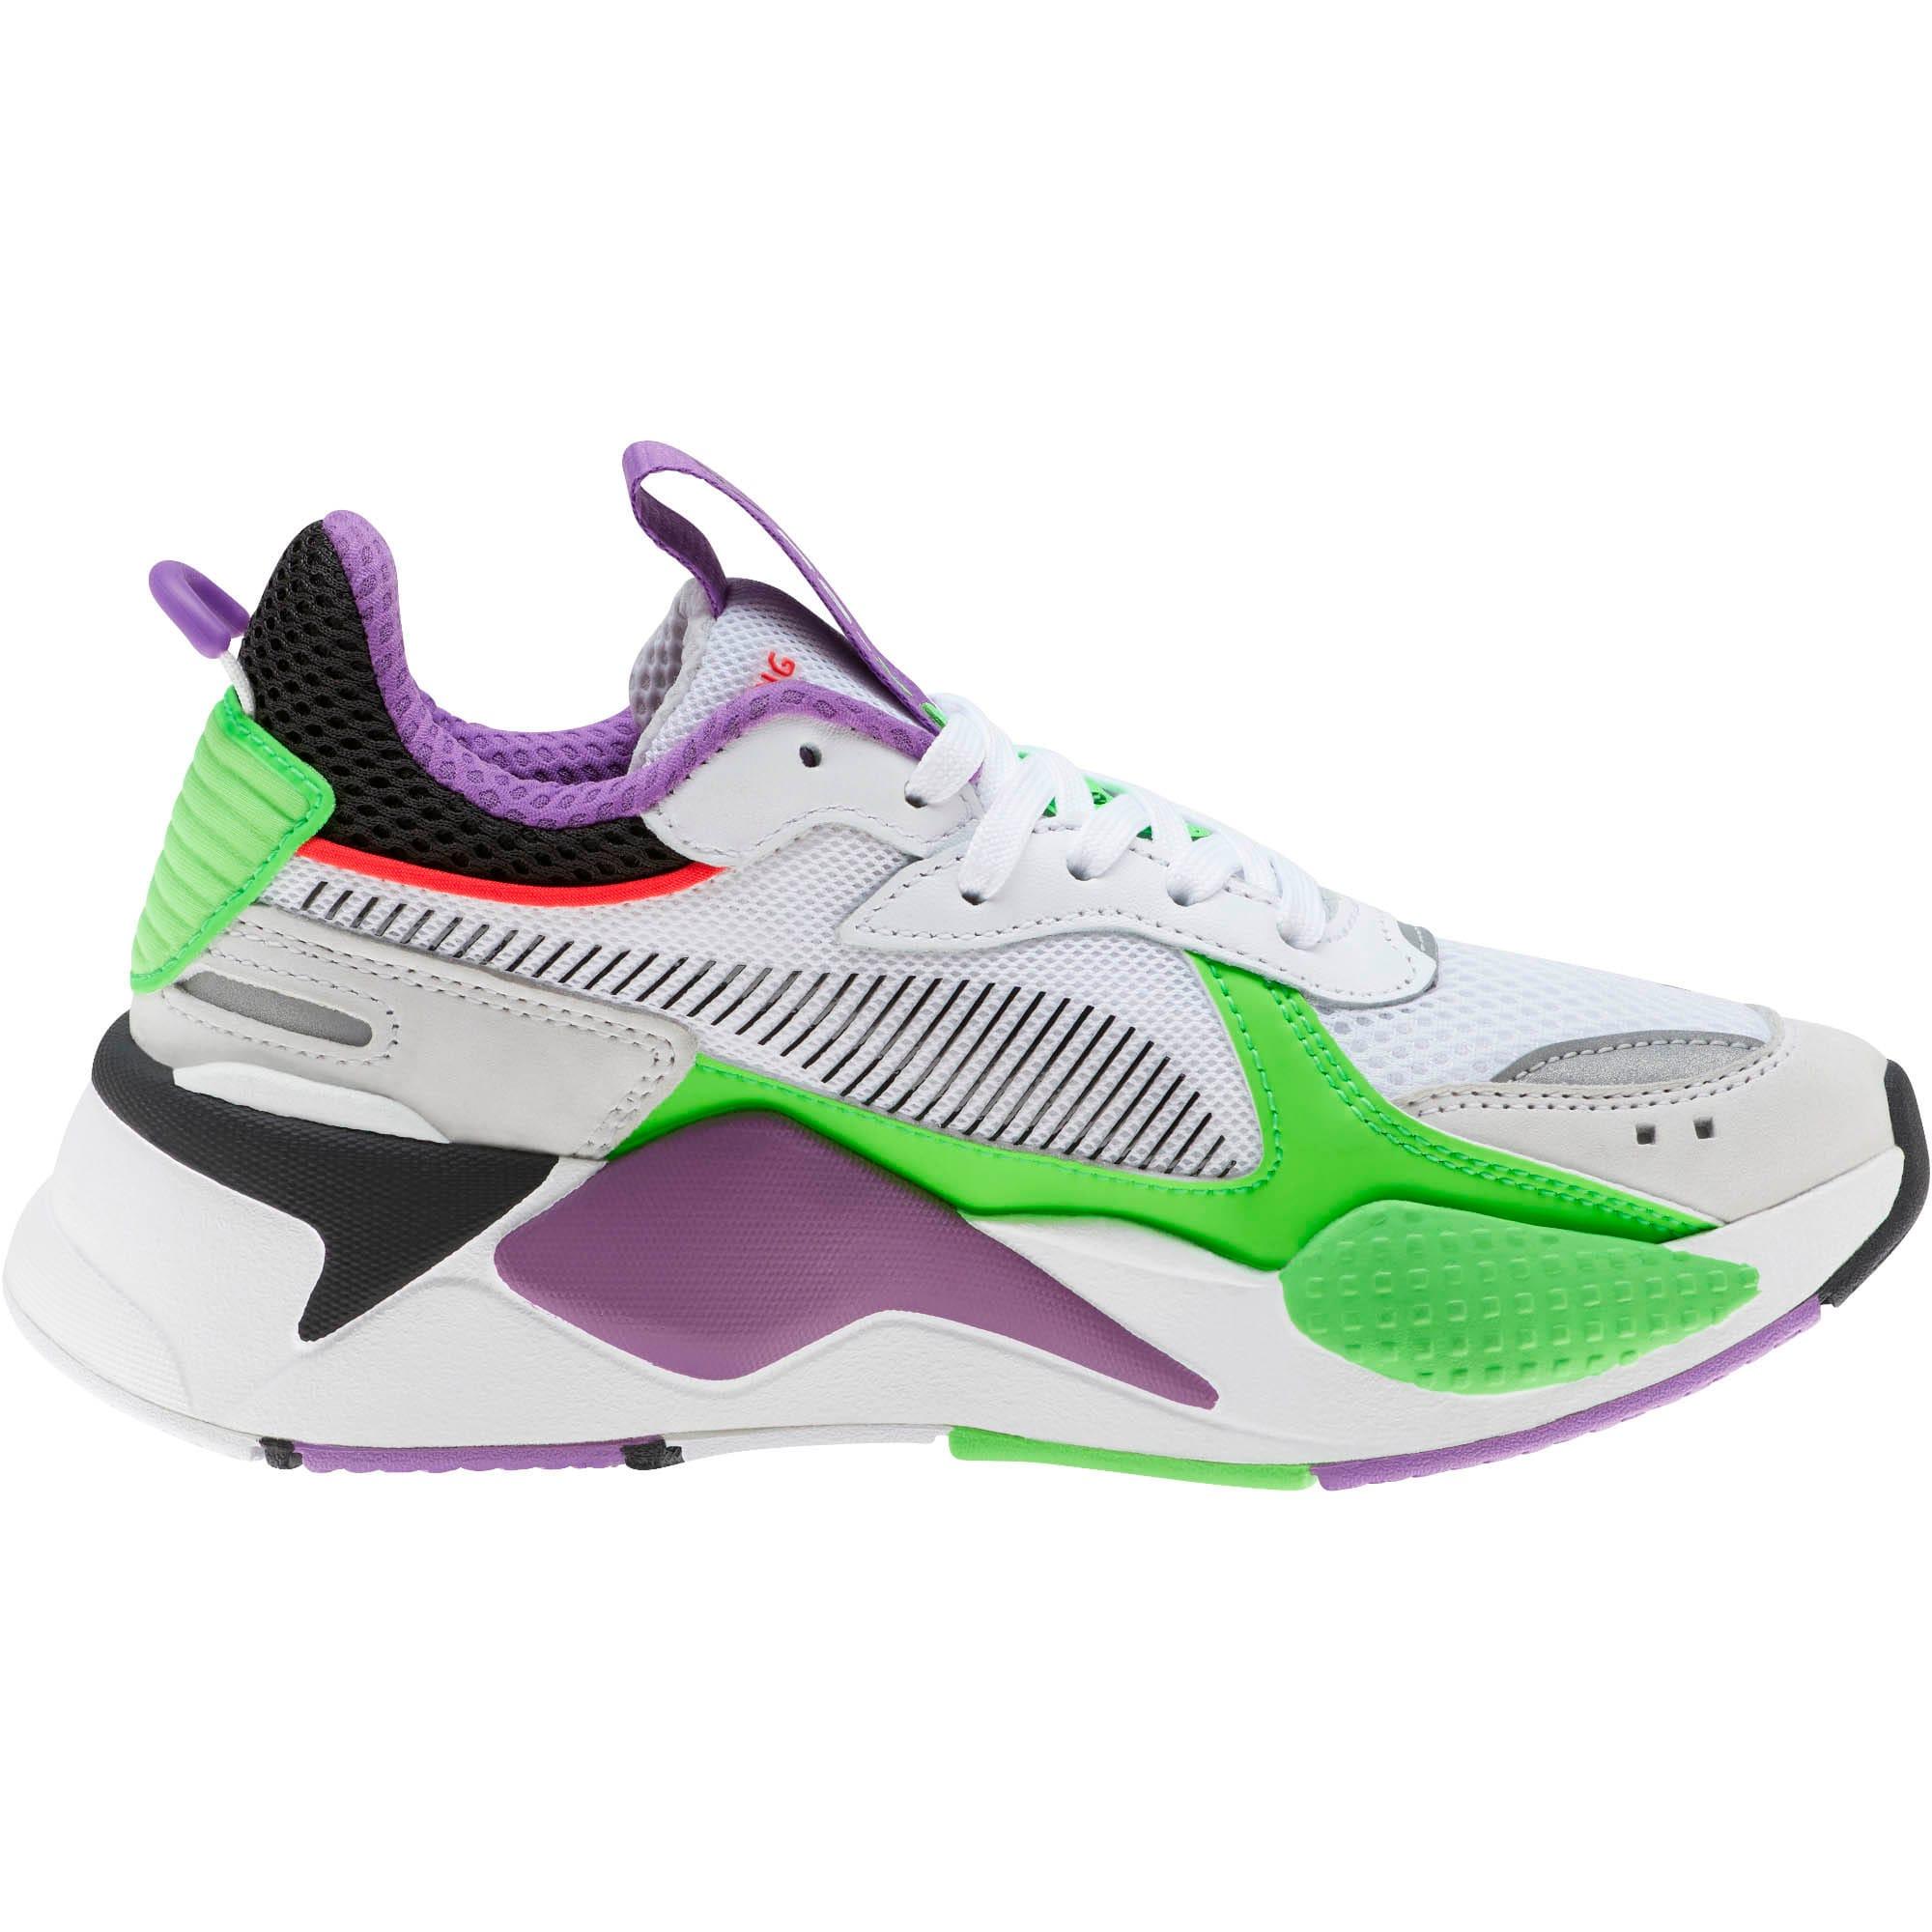 Thumbnail 4 of RS-X Bold Fluorescent Sneakers JR, PWhite-Gr Gecko-Royal Lilac, medium